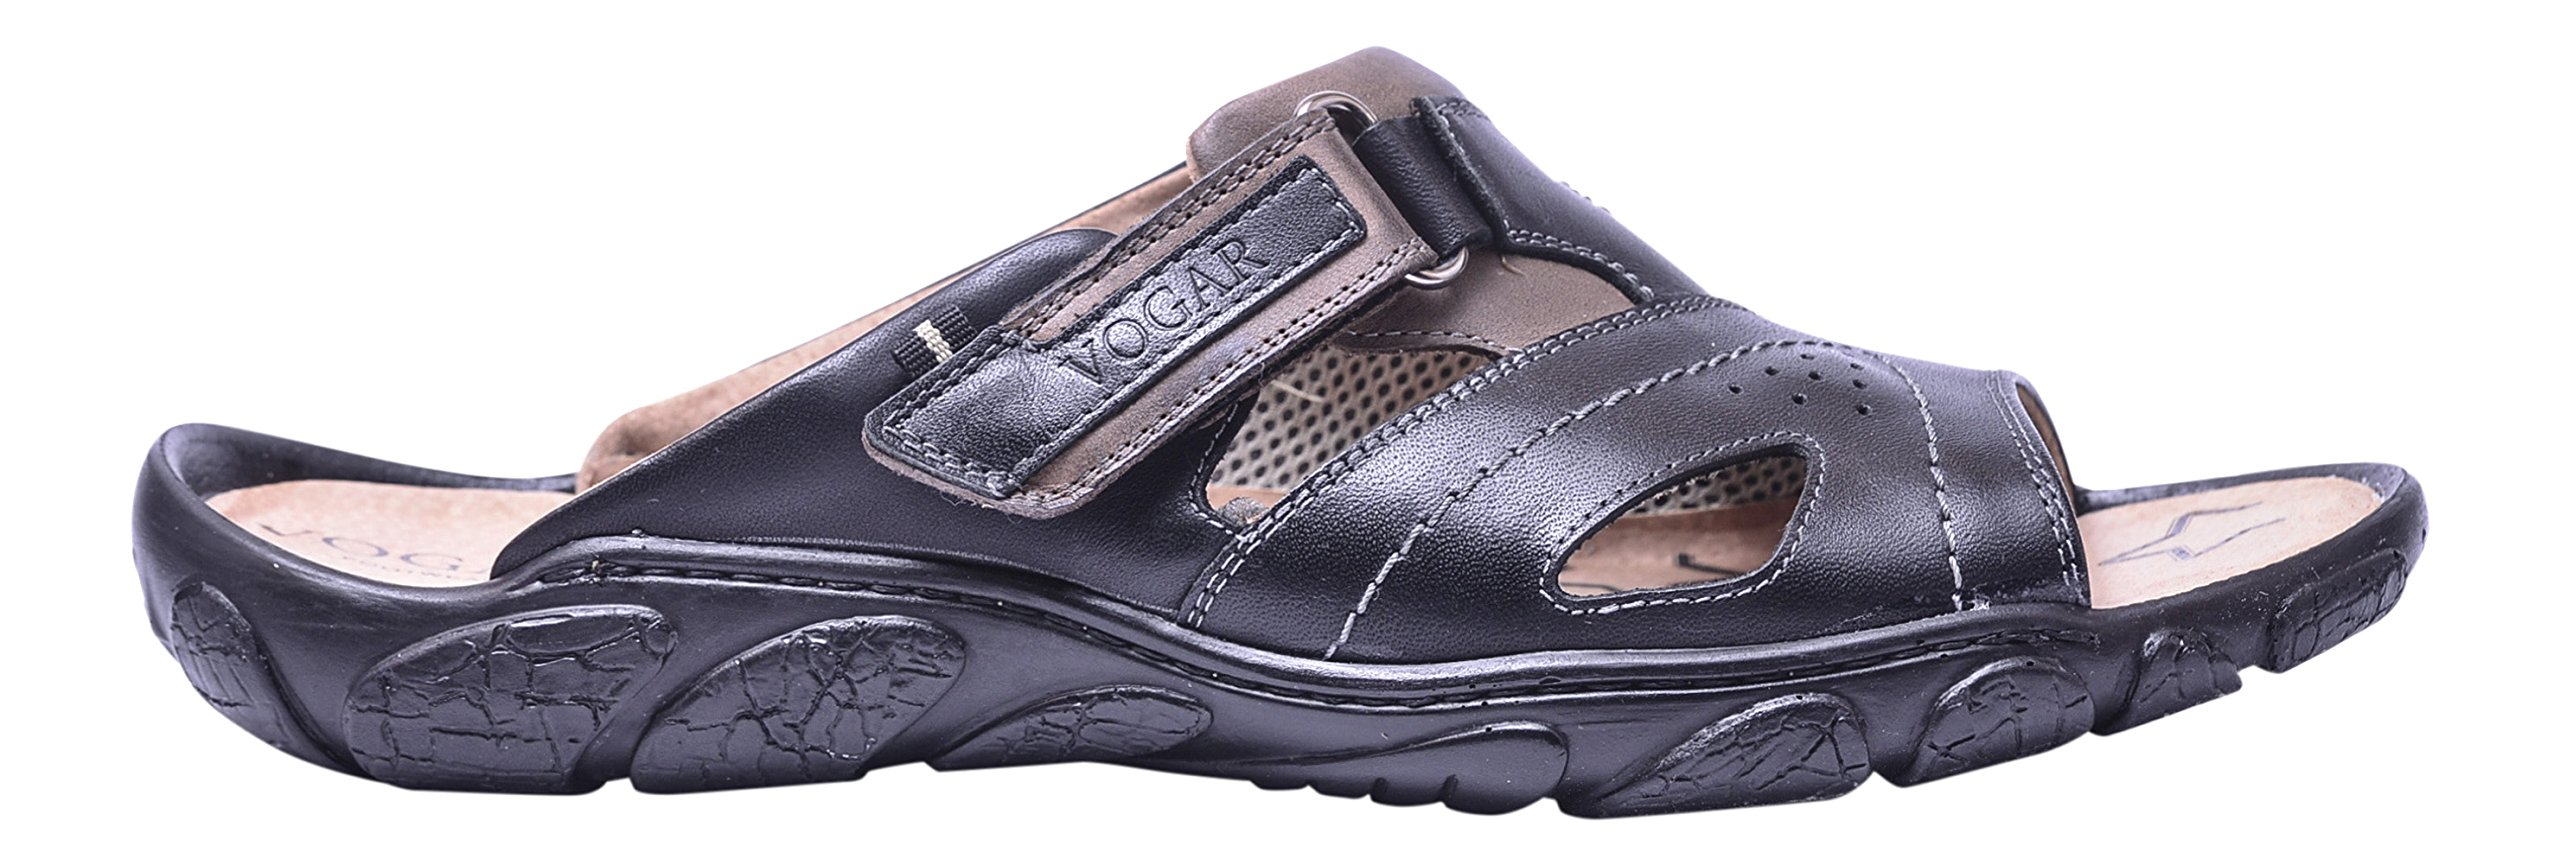 Vogar Mens Slip On Leather Summer Sandals Flat Beach Shoes VG1128 Black 9 US